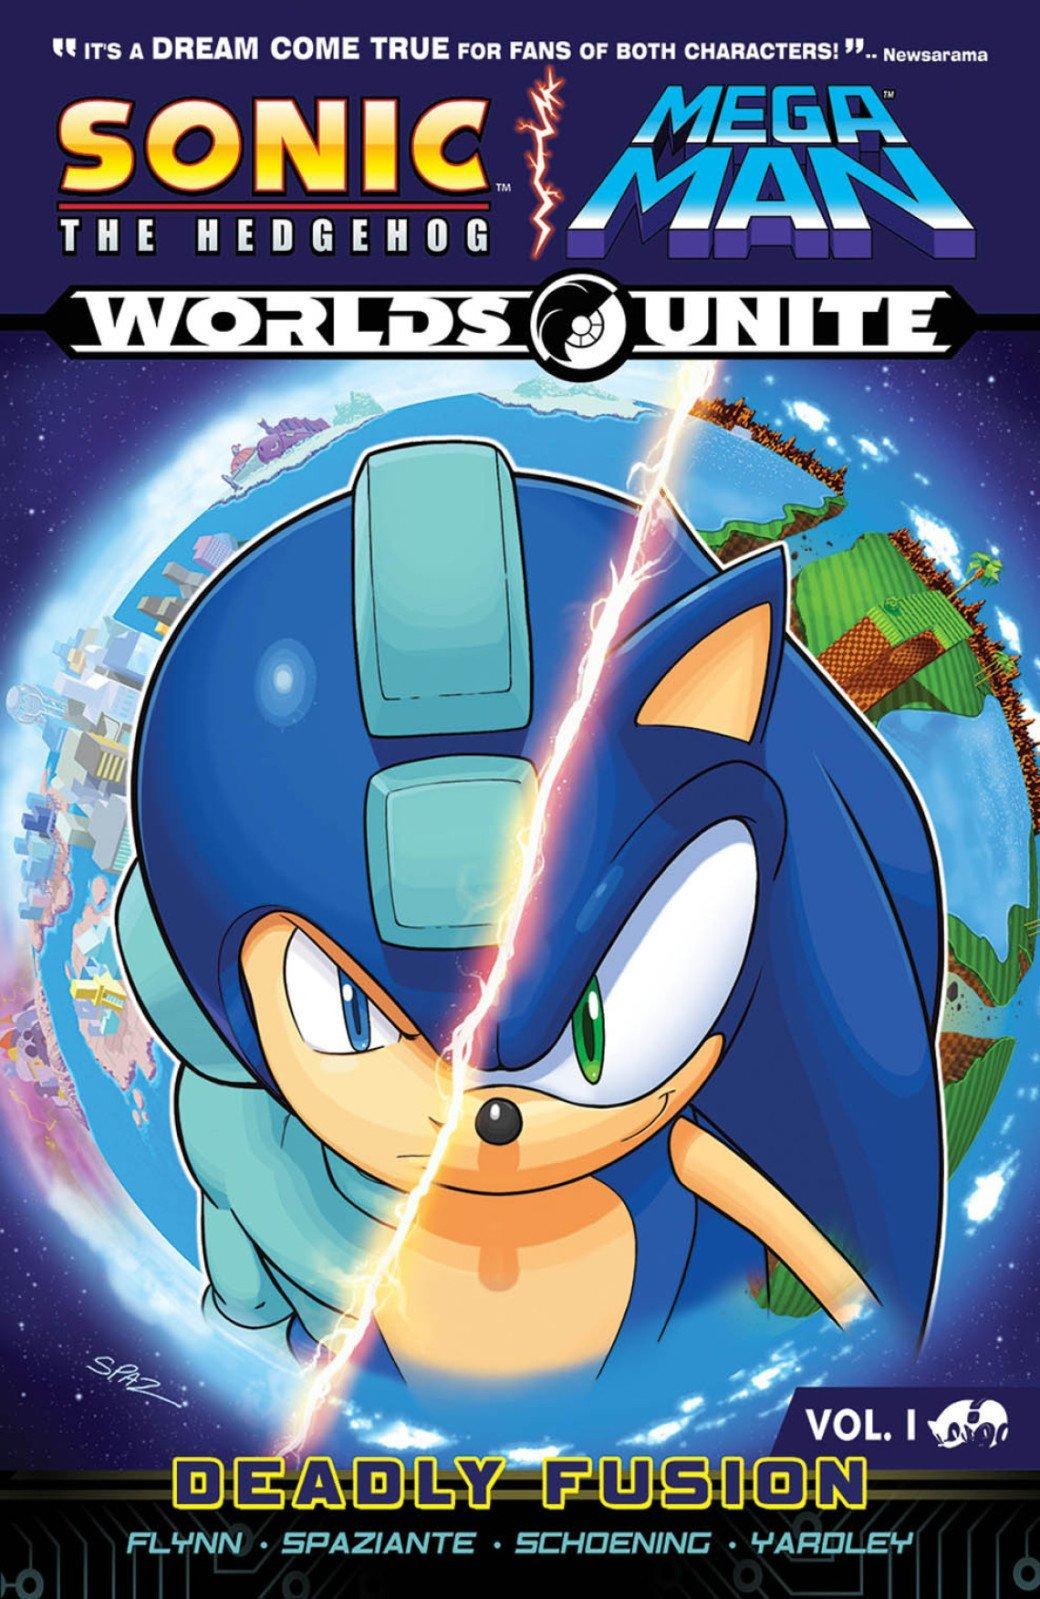 Sonic the Hedgehog / Mega Man: Worlds Unite Vol.1 - Deadly Fusion